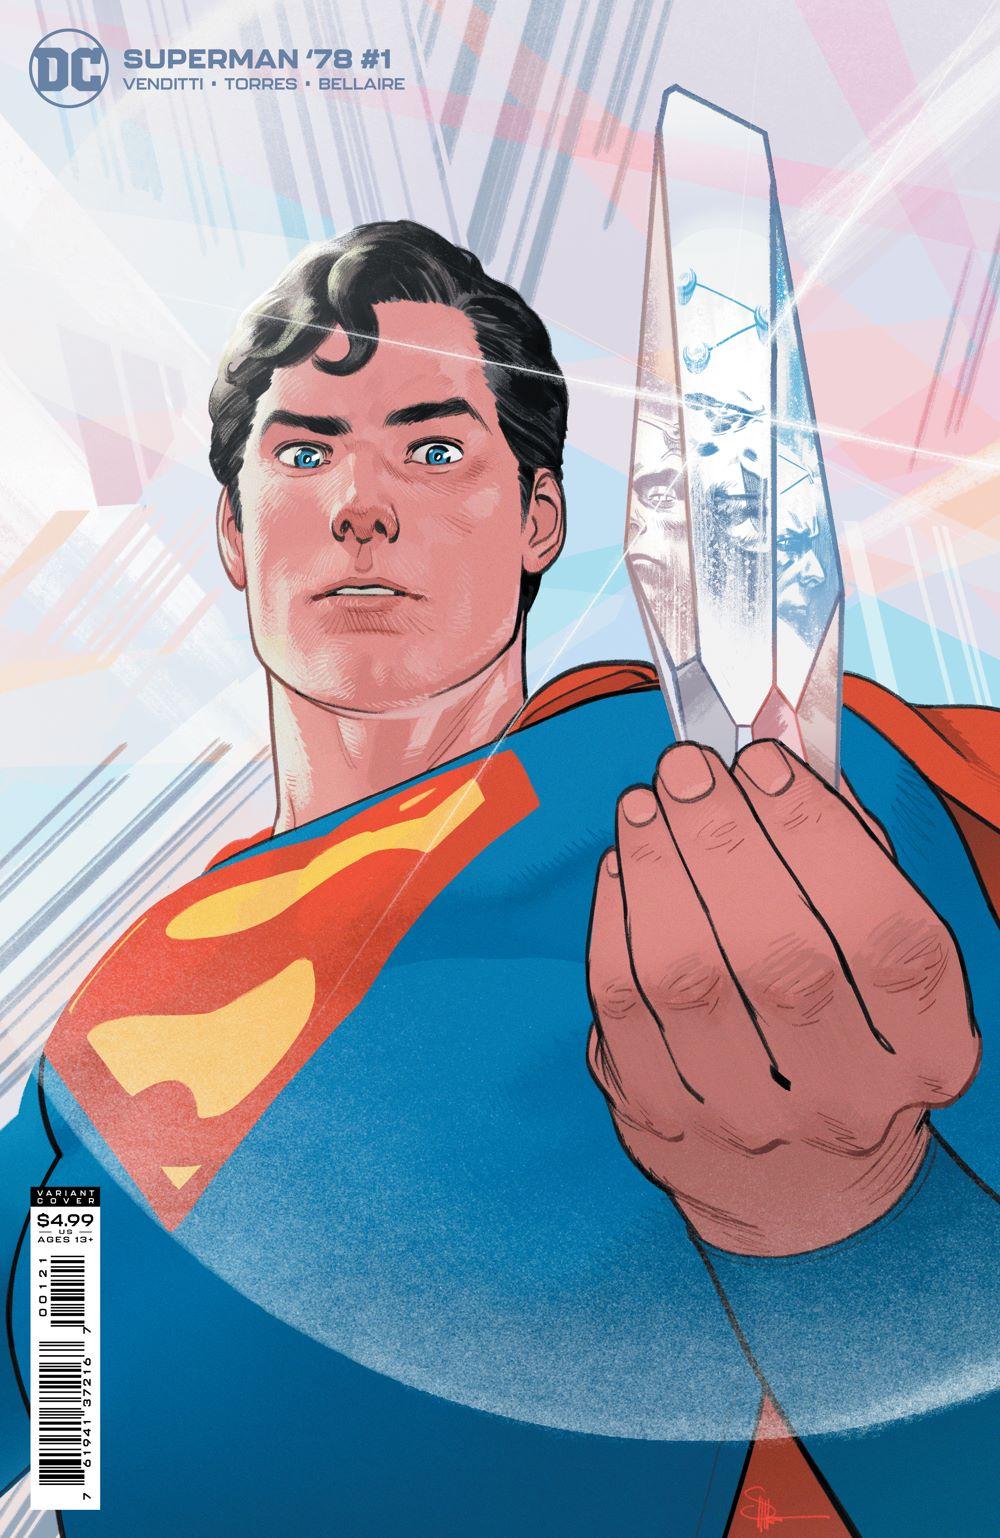 SM78_Cv1_var_00121 DC Comics August 2021 Solicitations